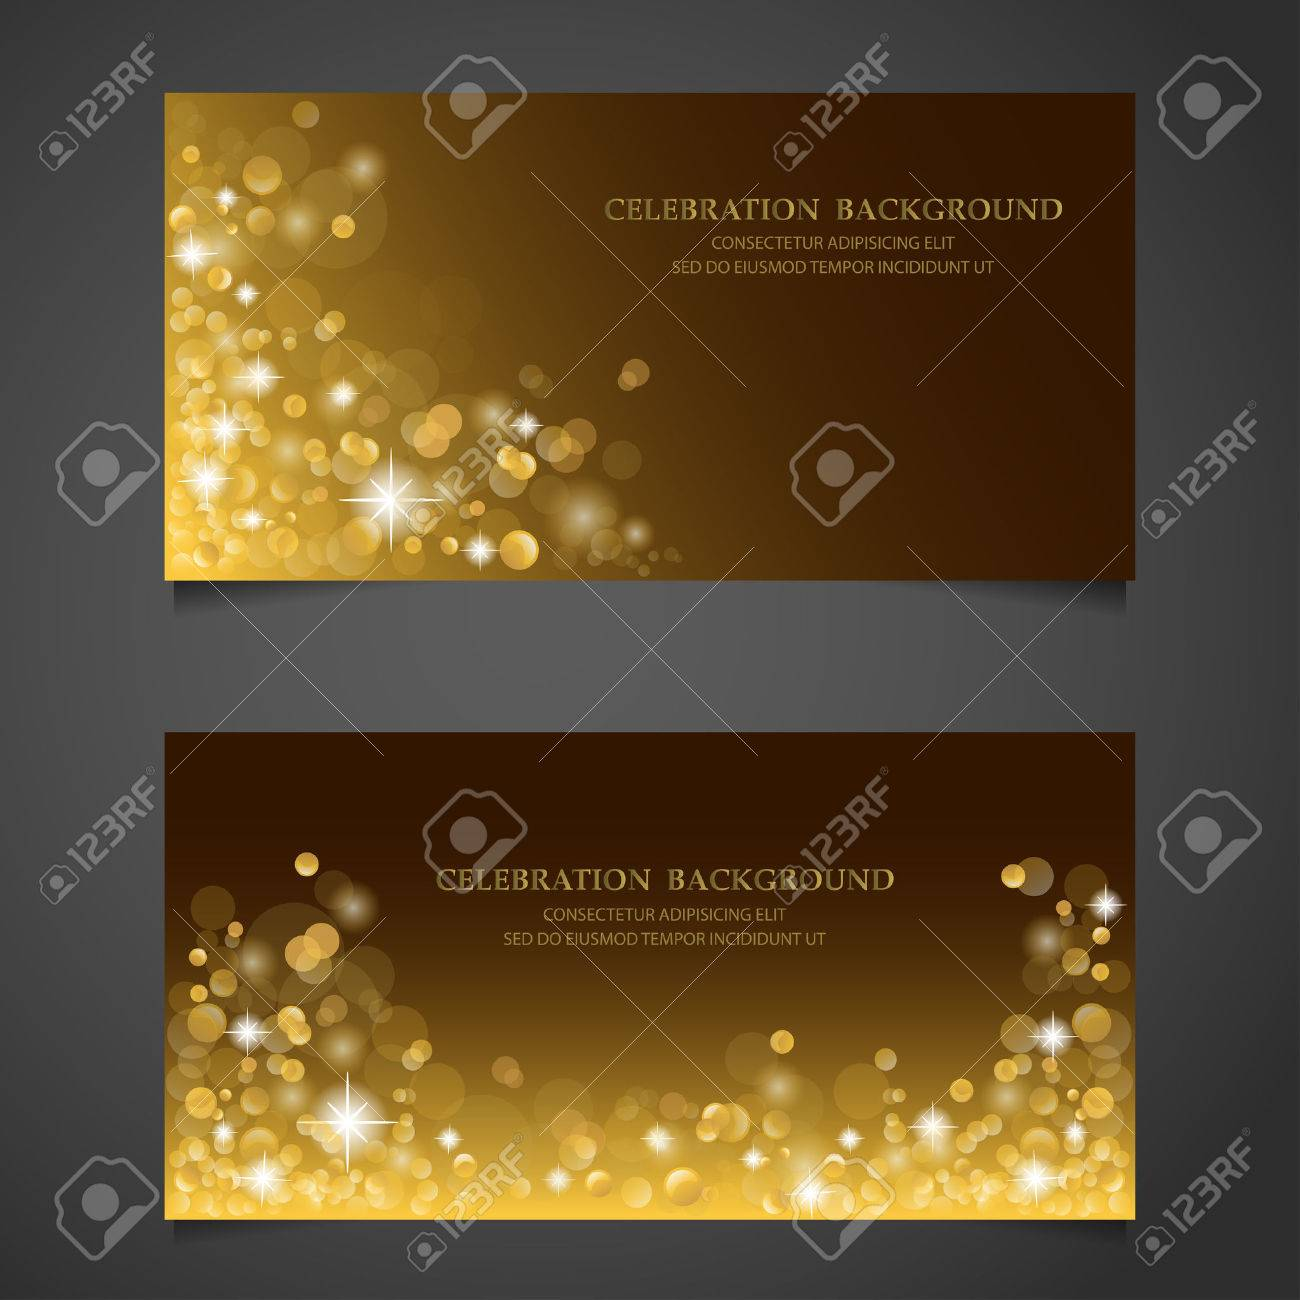 Golden sparkles banner set. background, premium concept. gift voucher certificate coupon. web design. vector illustration - 48758299